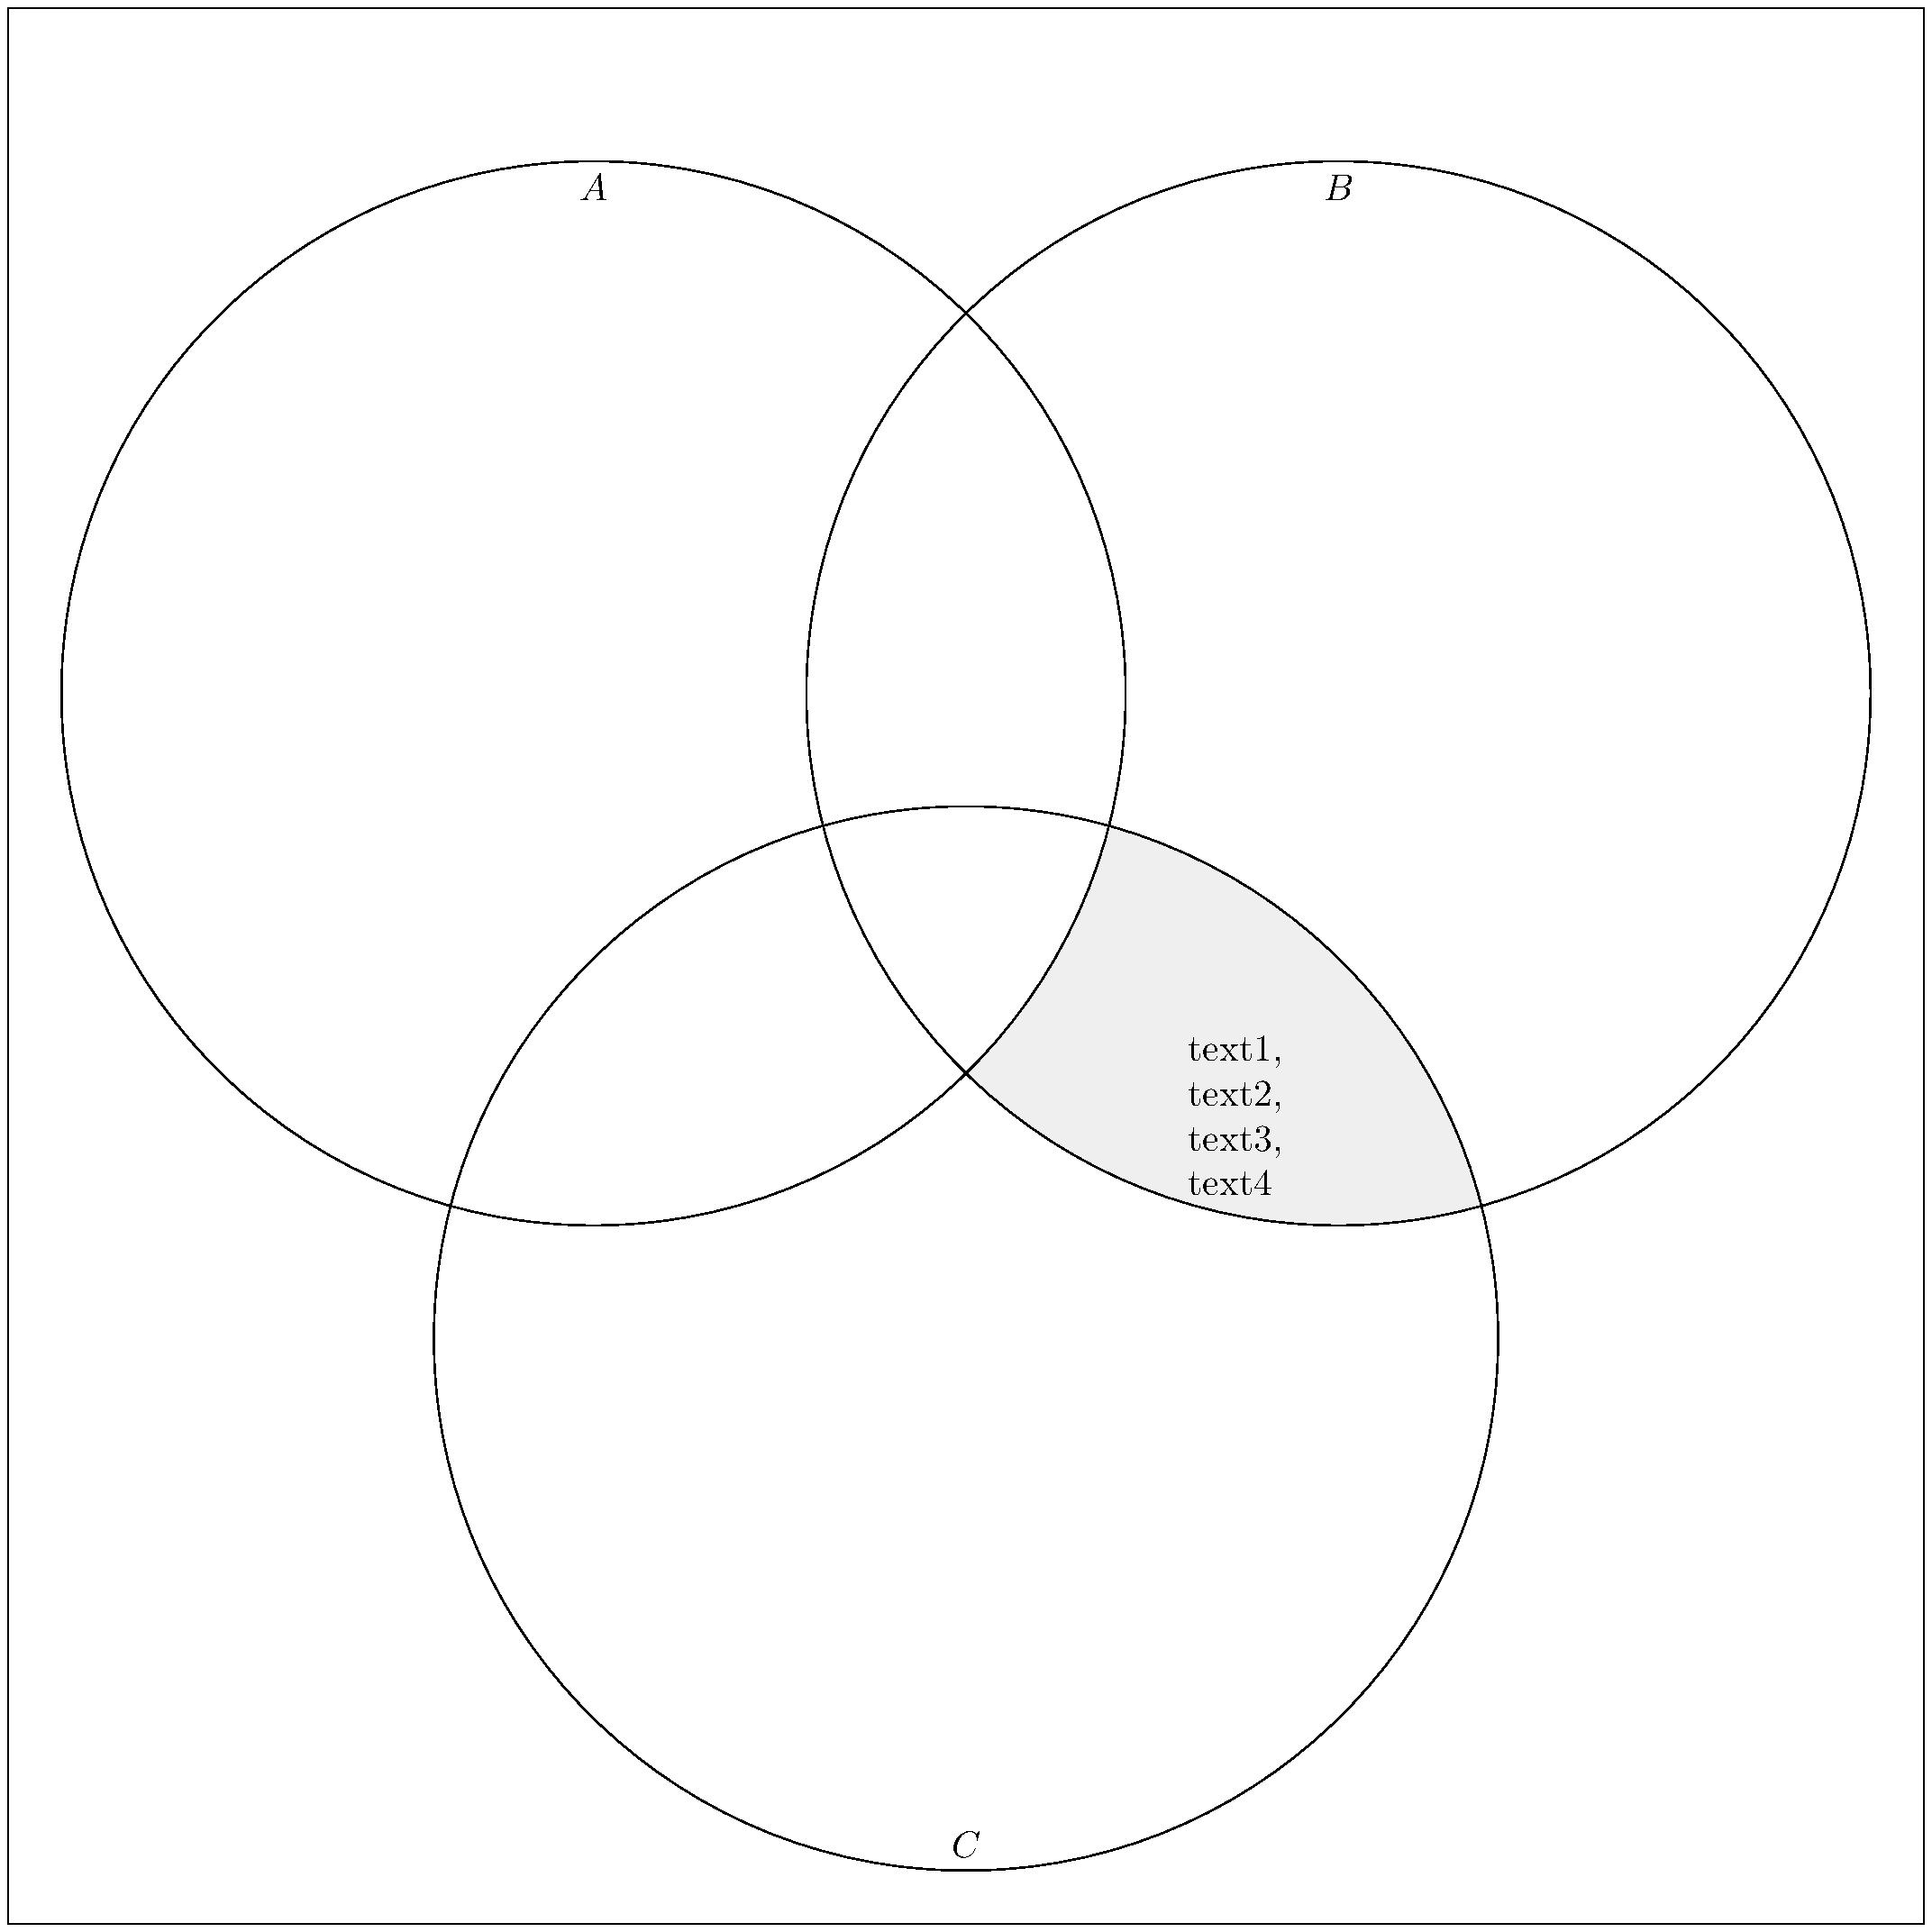 Tex venn diagram wiring library i8rvr tex venn diagramhtml 3 way venn diagram wiring 3 way venn diagram wiring